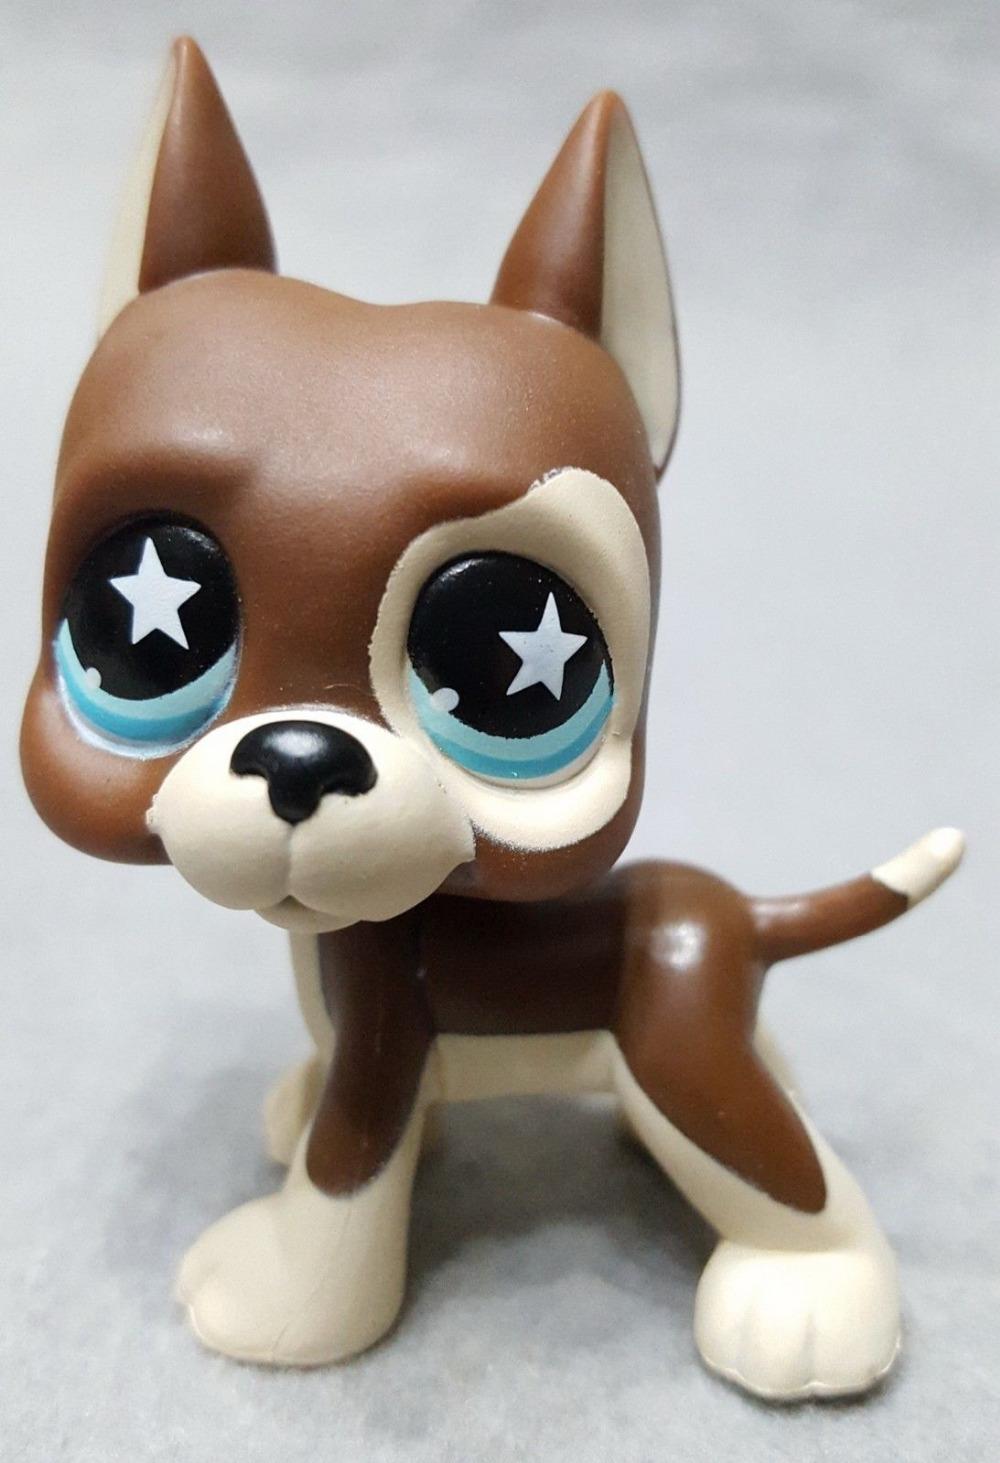 Genuine Original Littlest Dog Figure #817 Great Dane Puppy Tan Brown Blue Star Eyes Pet Doll Loose Toys Shop for kids Gift(China (Mainland))